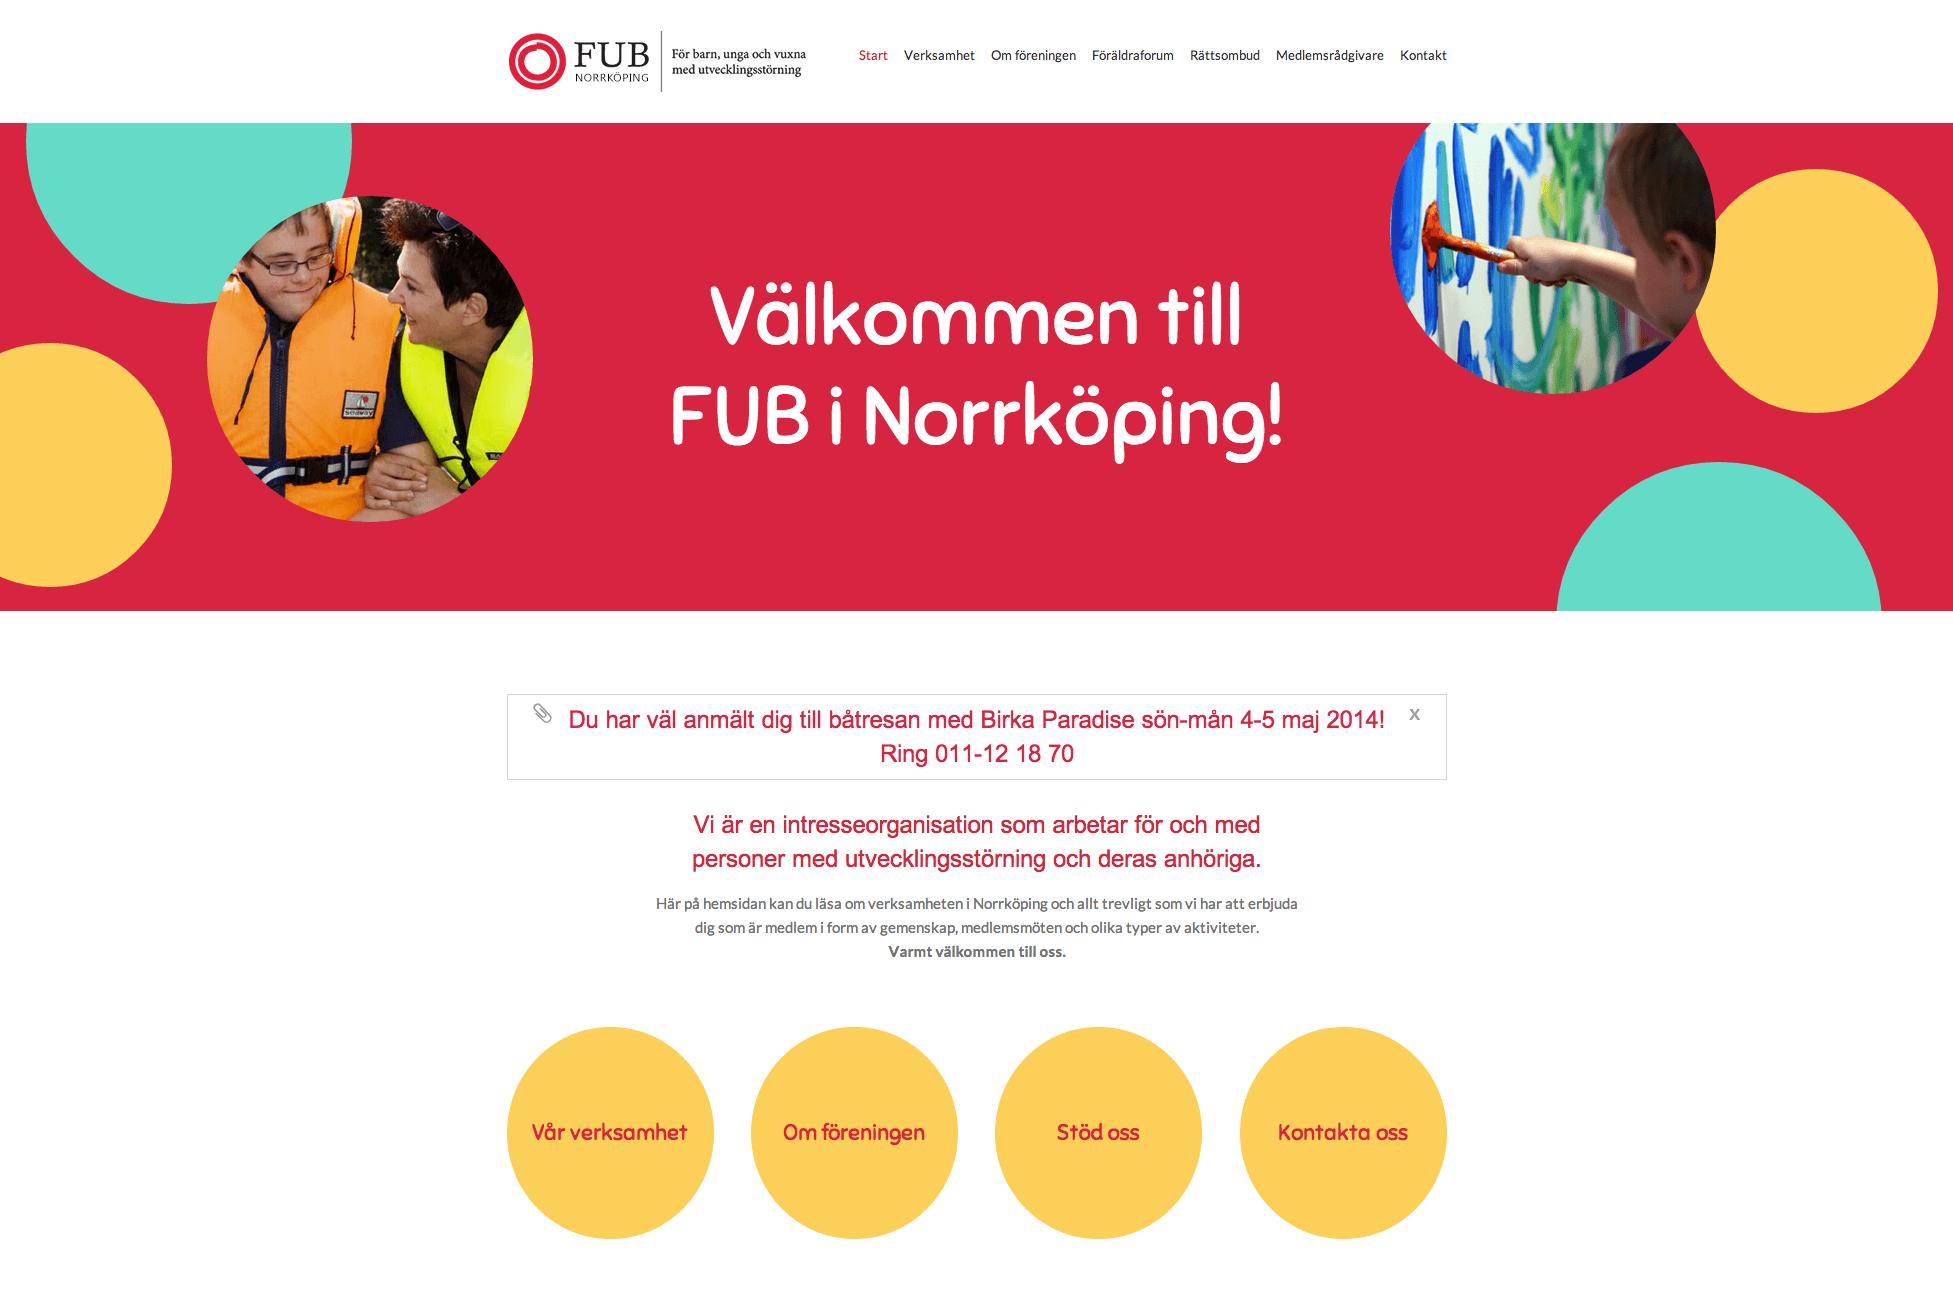 FUB i Norrköping